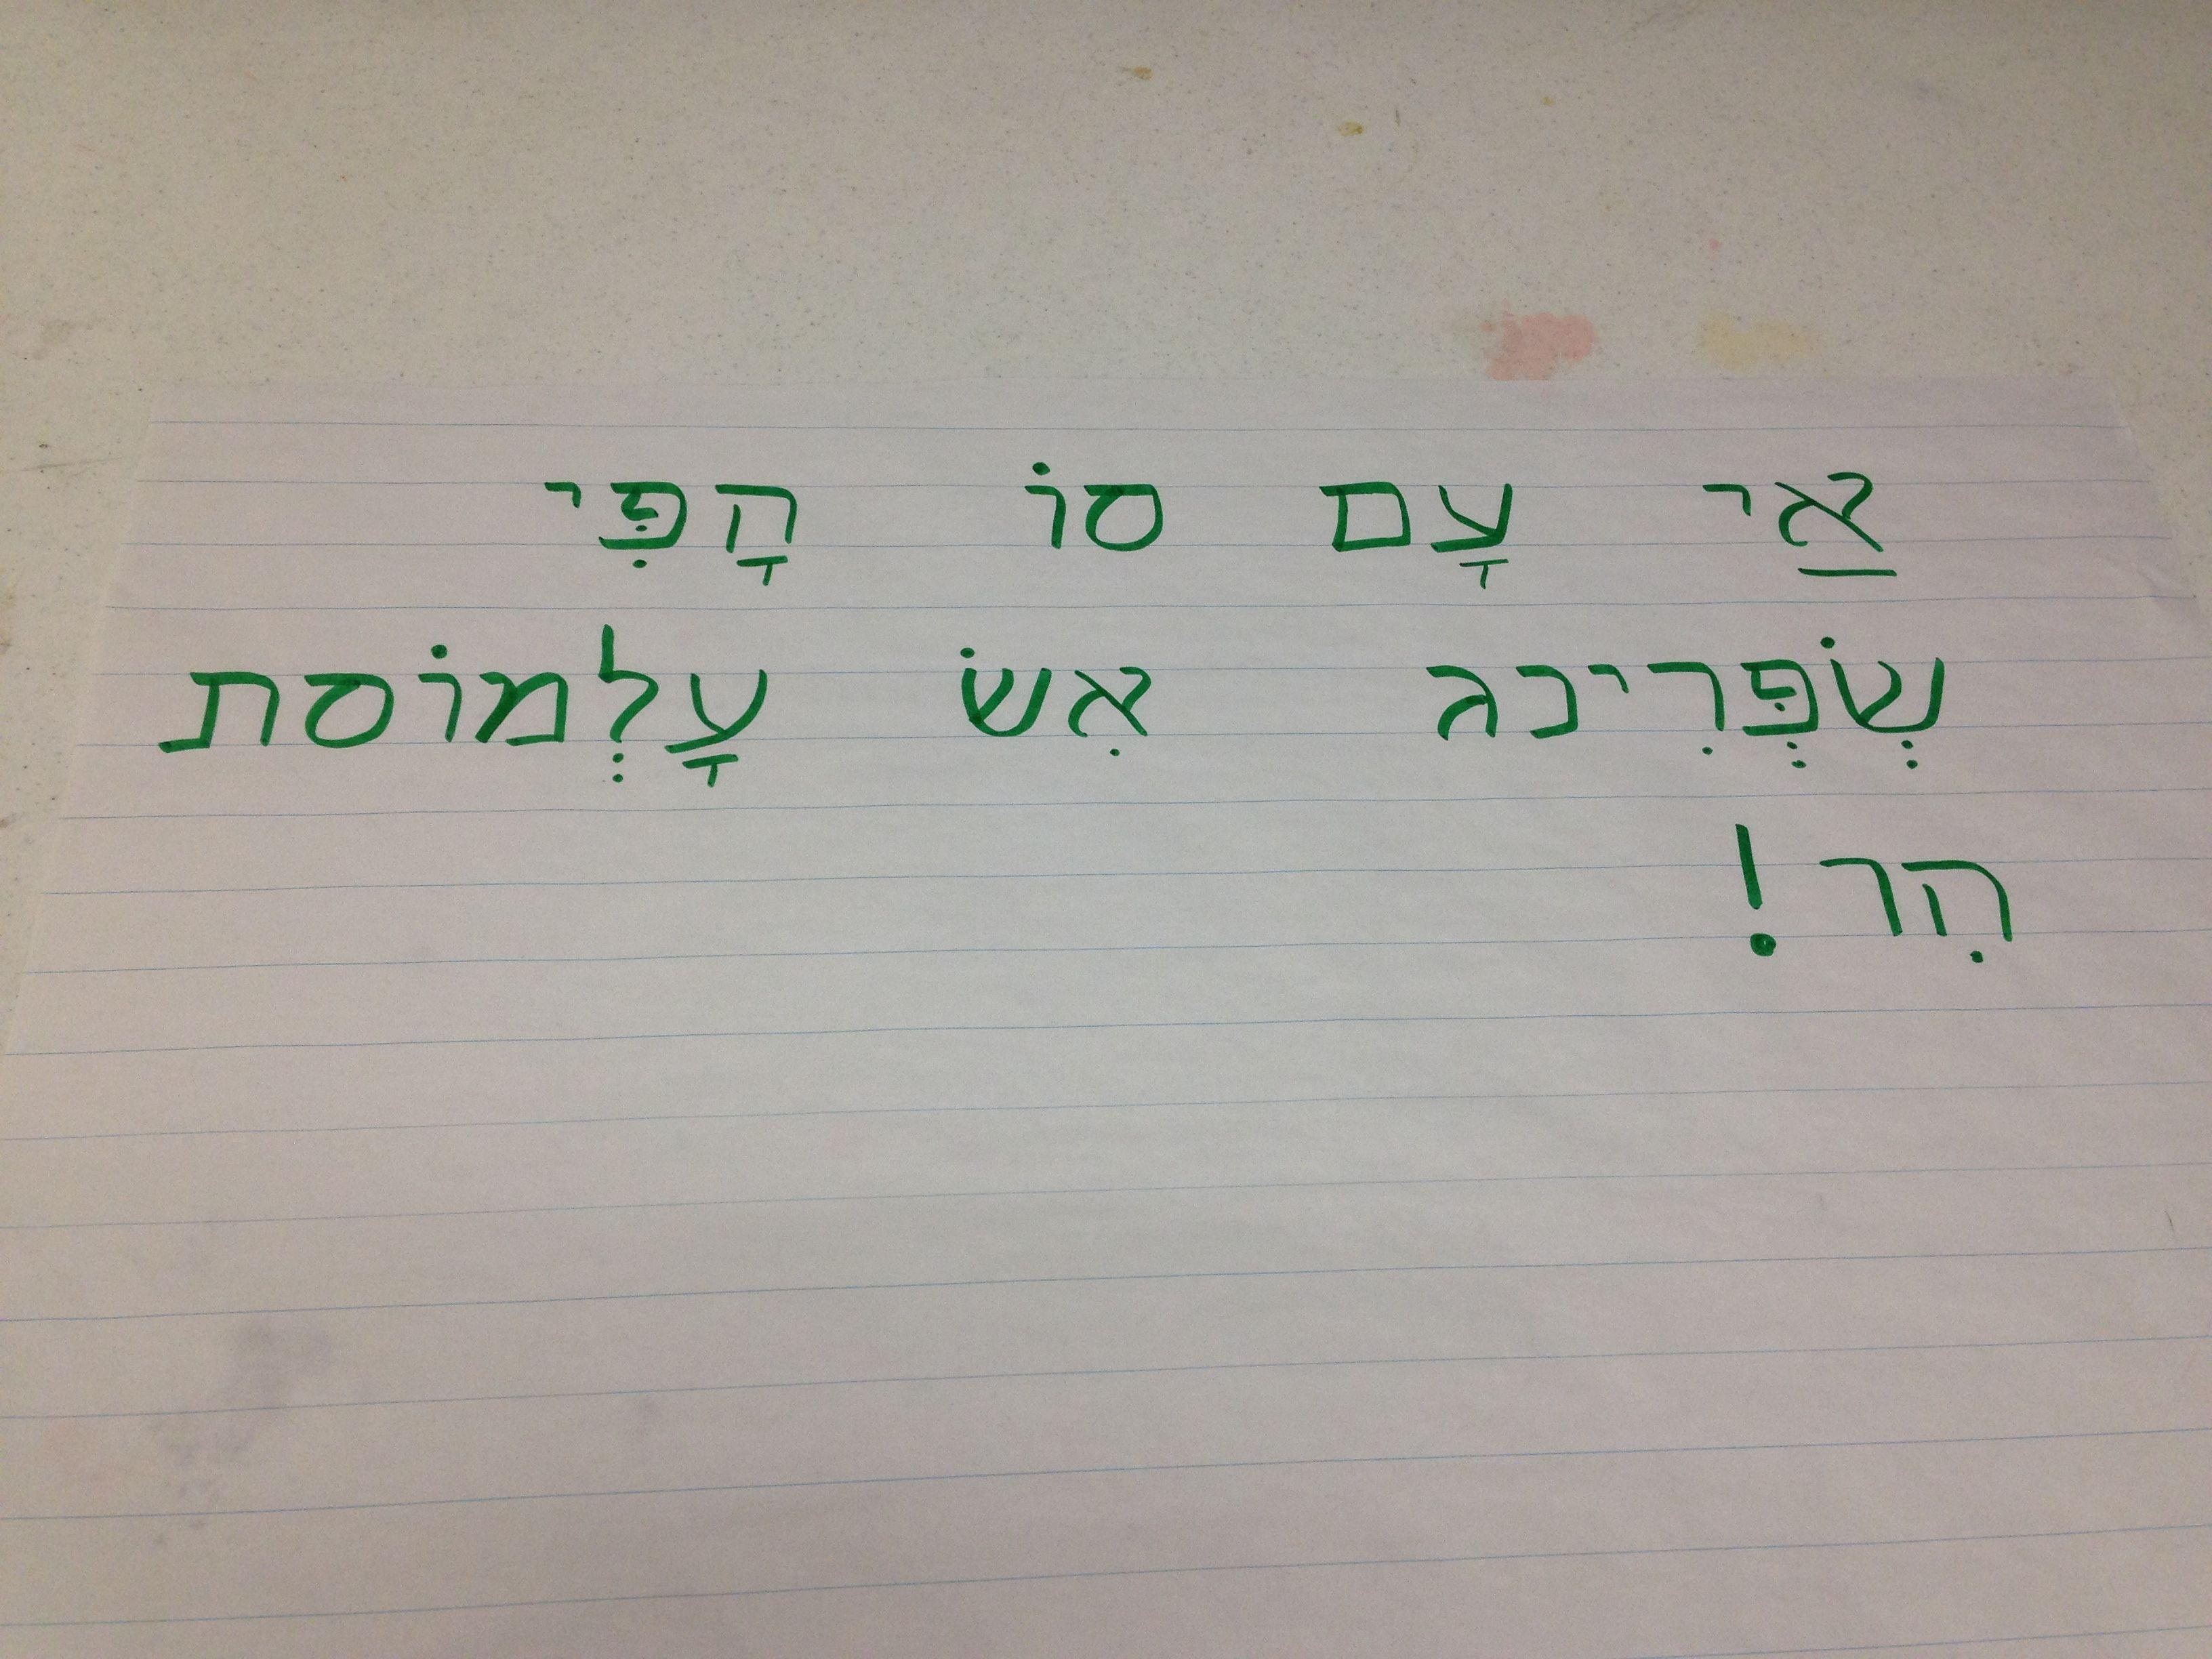 More Hebrew Decoding Practice Heblish English Words